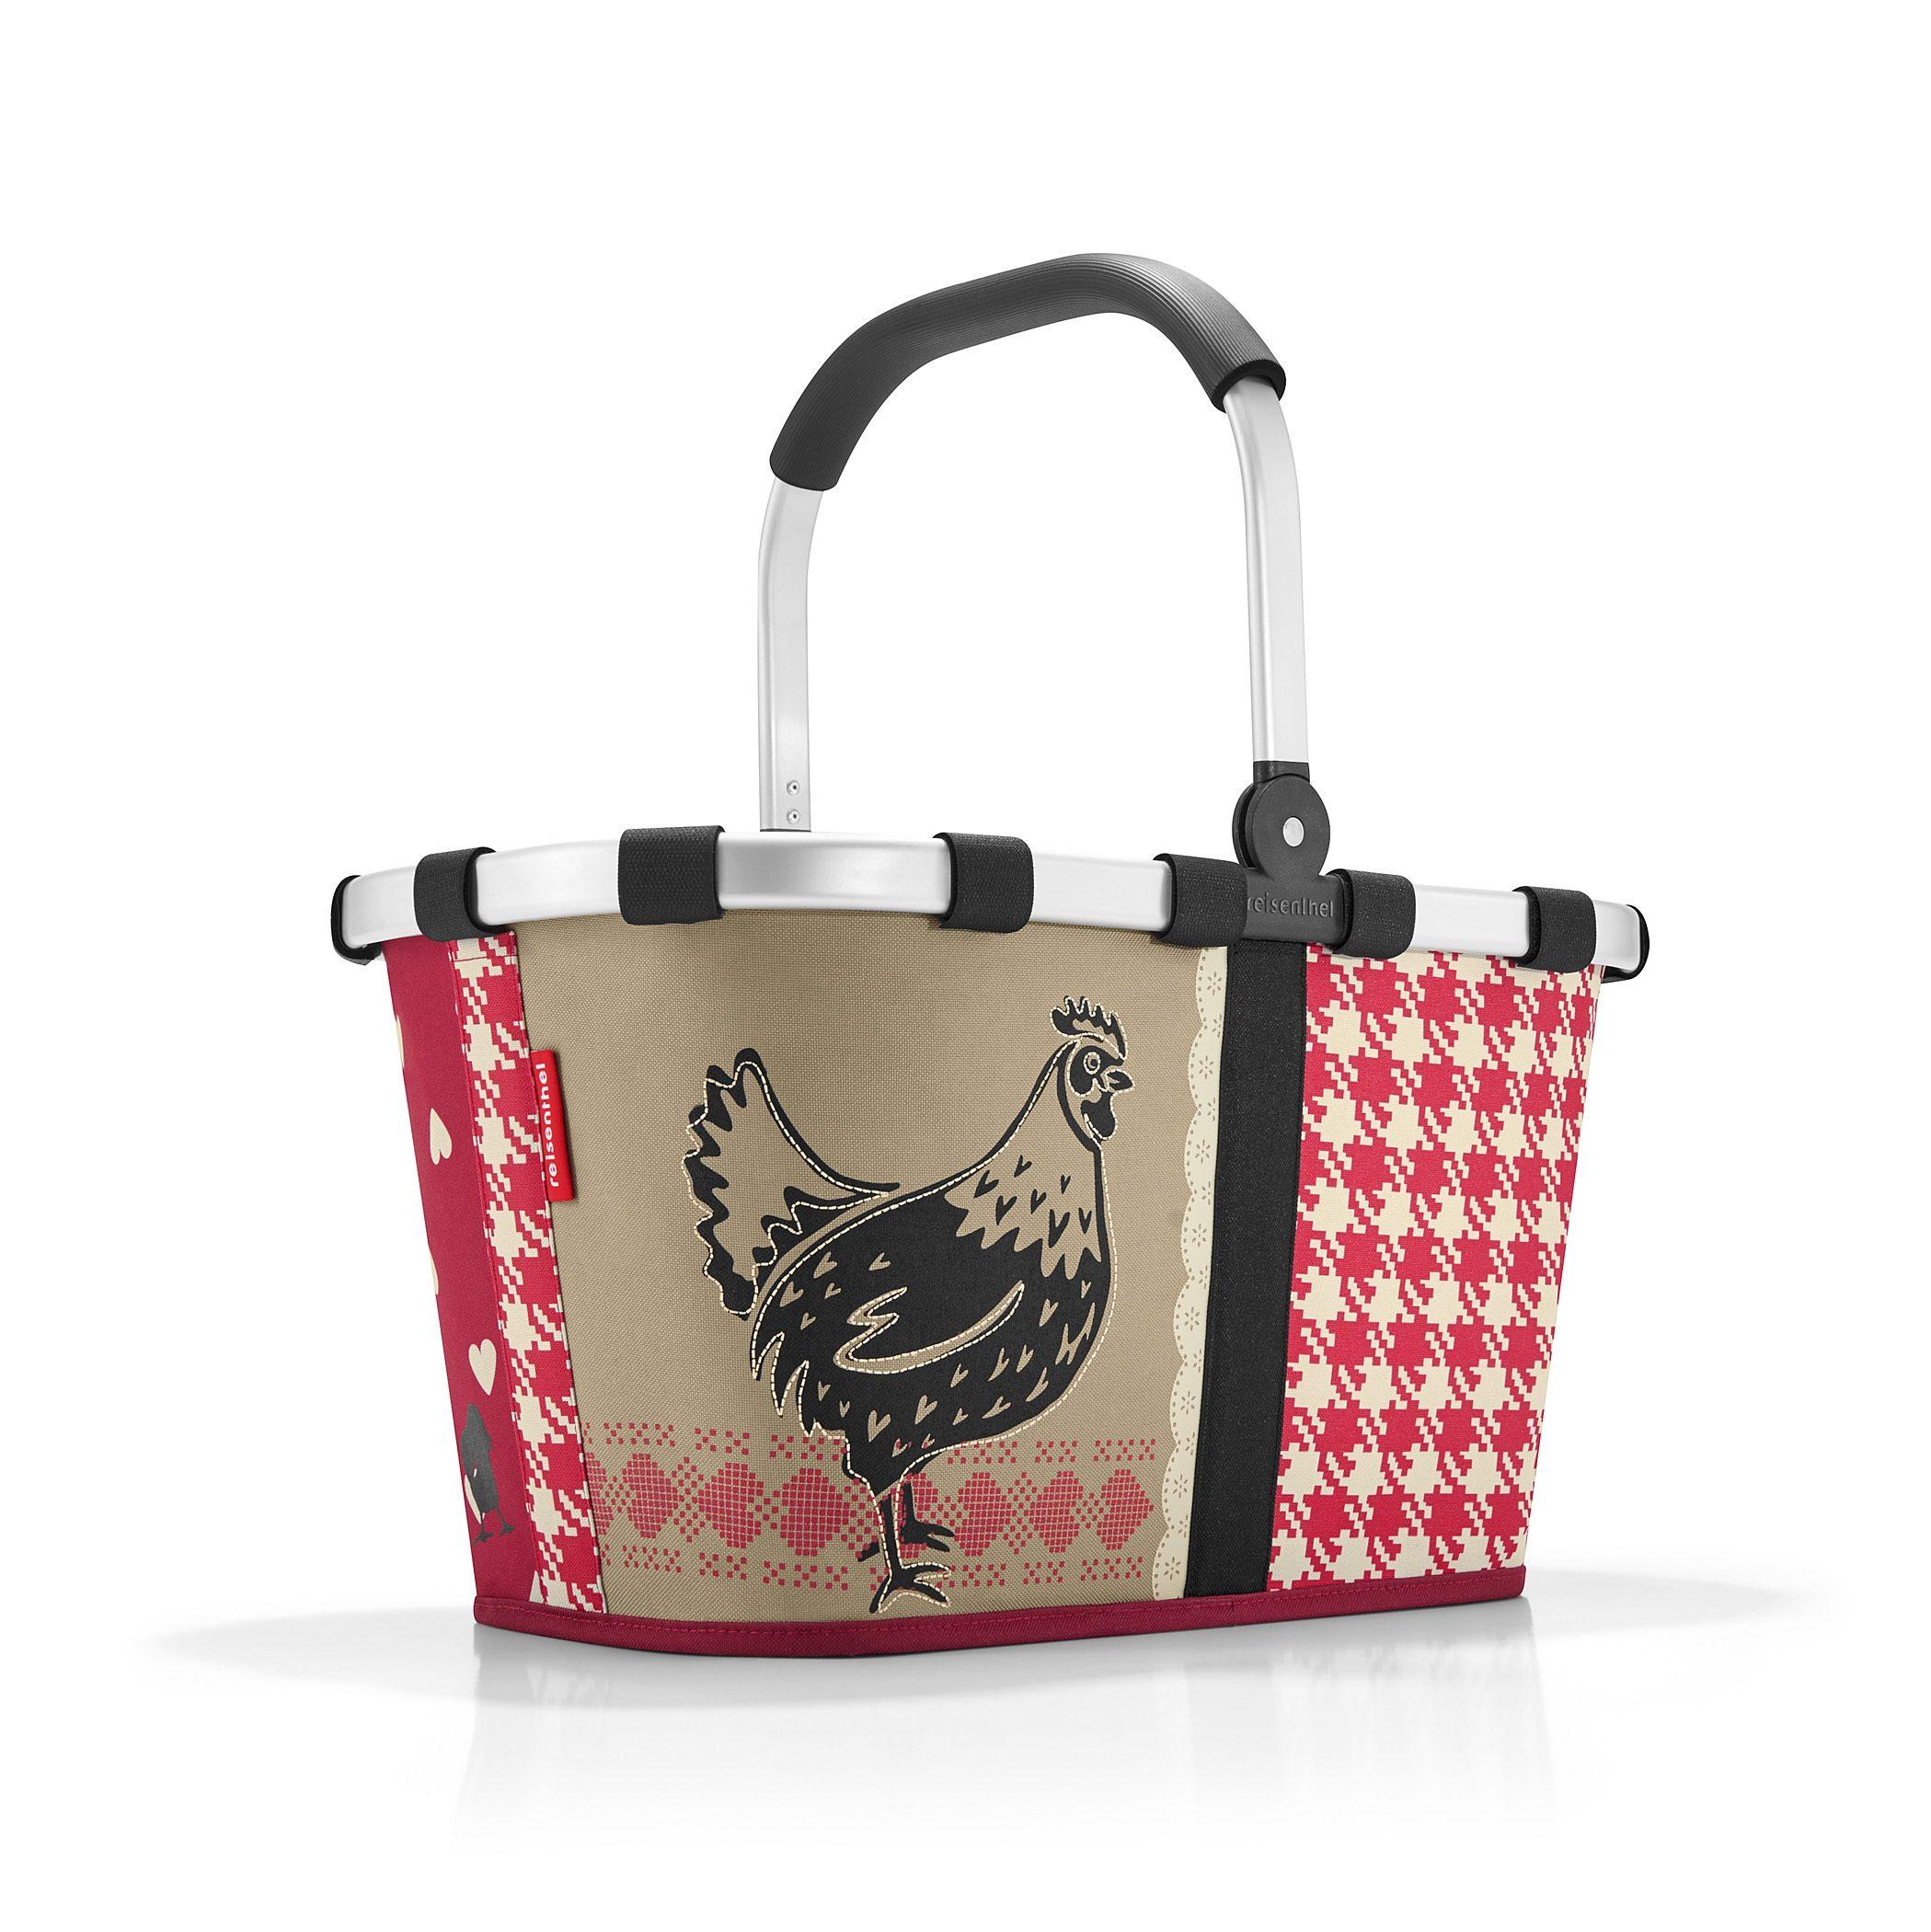 REISENTHEL® Einkaufskorb »carrybag special edition country«